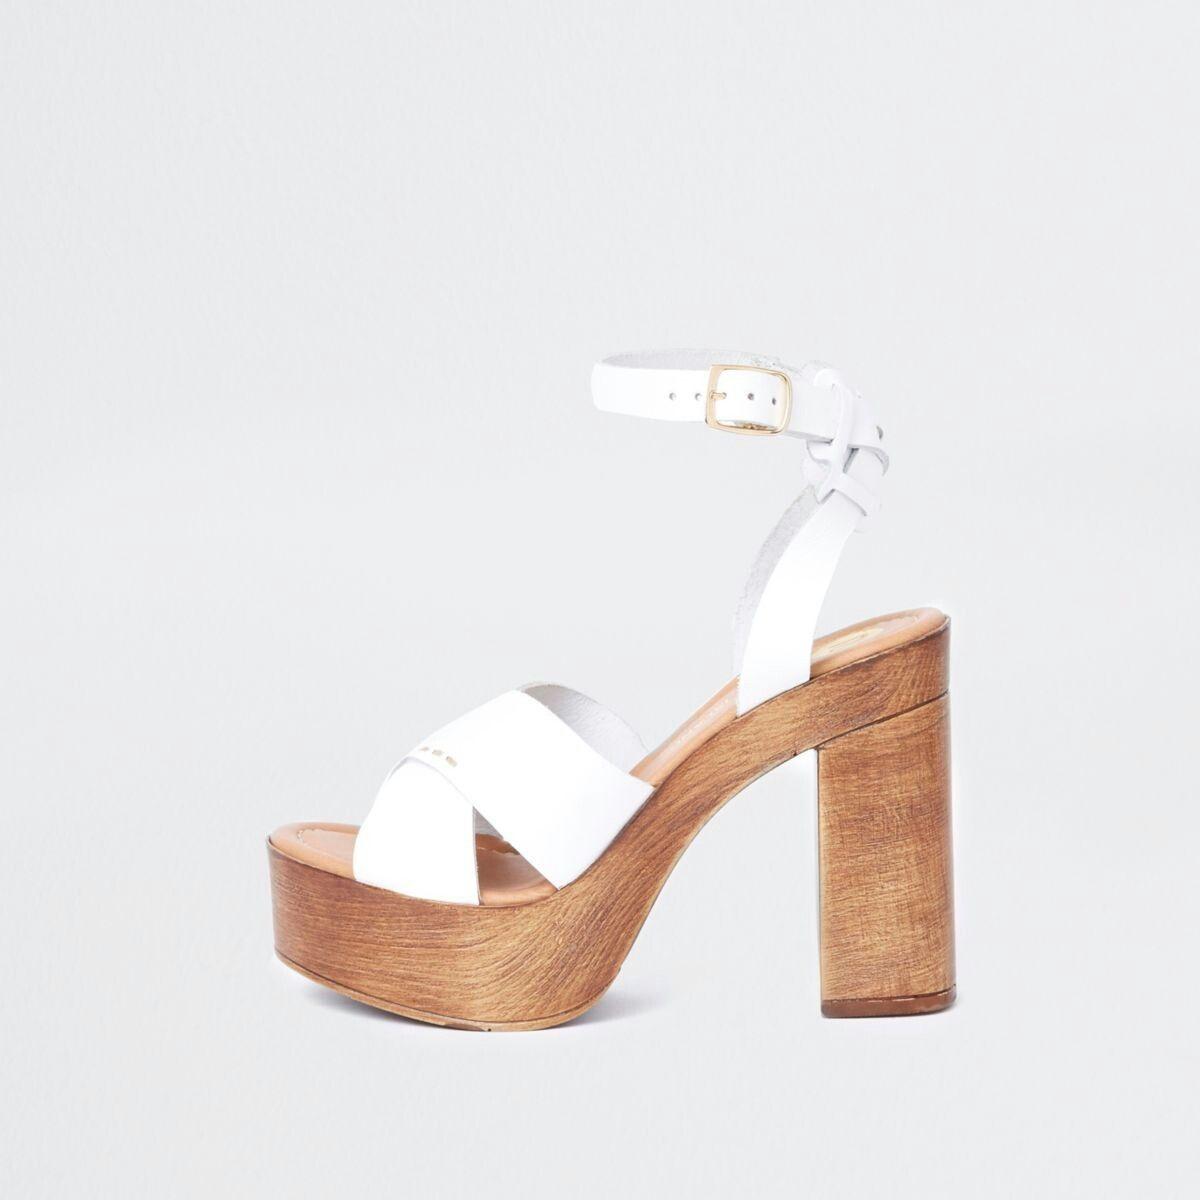 4709d9c0c4a White cross strap platform heel sandals